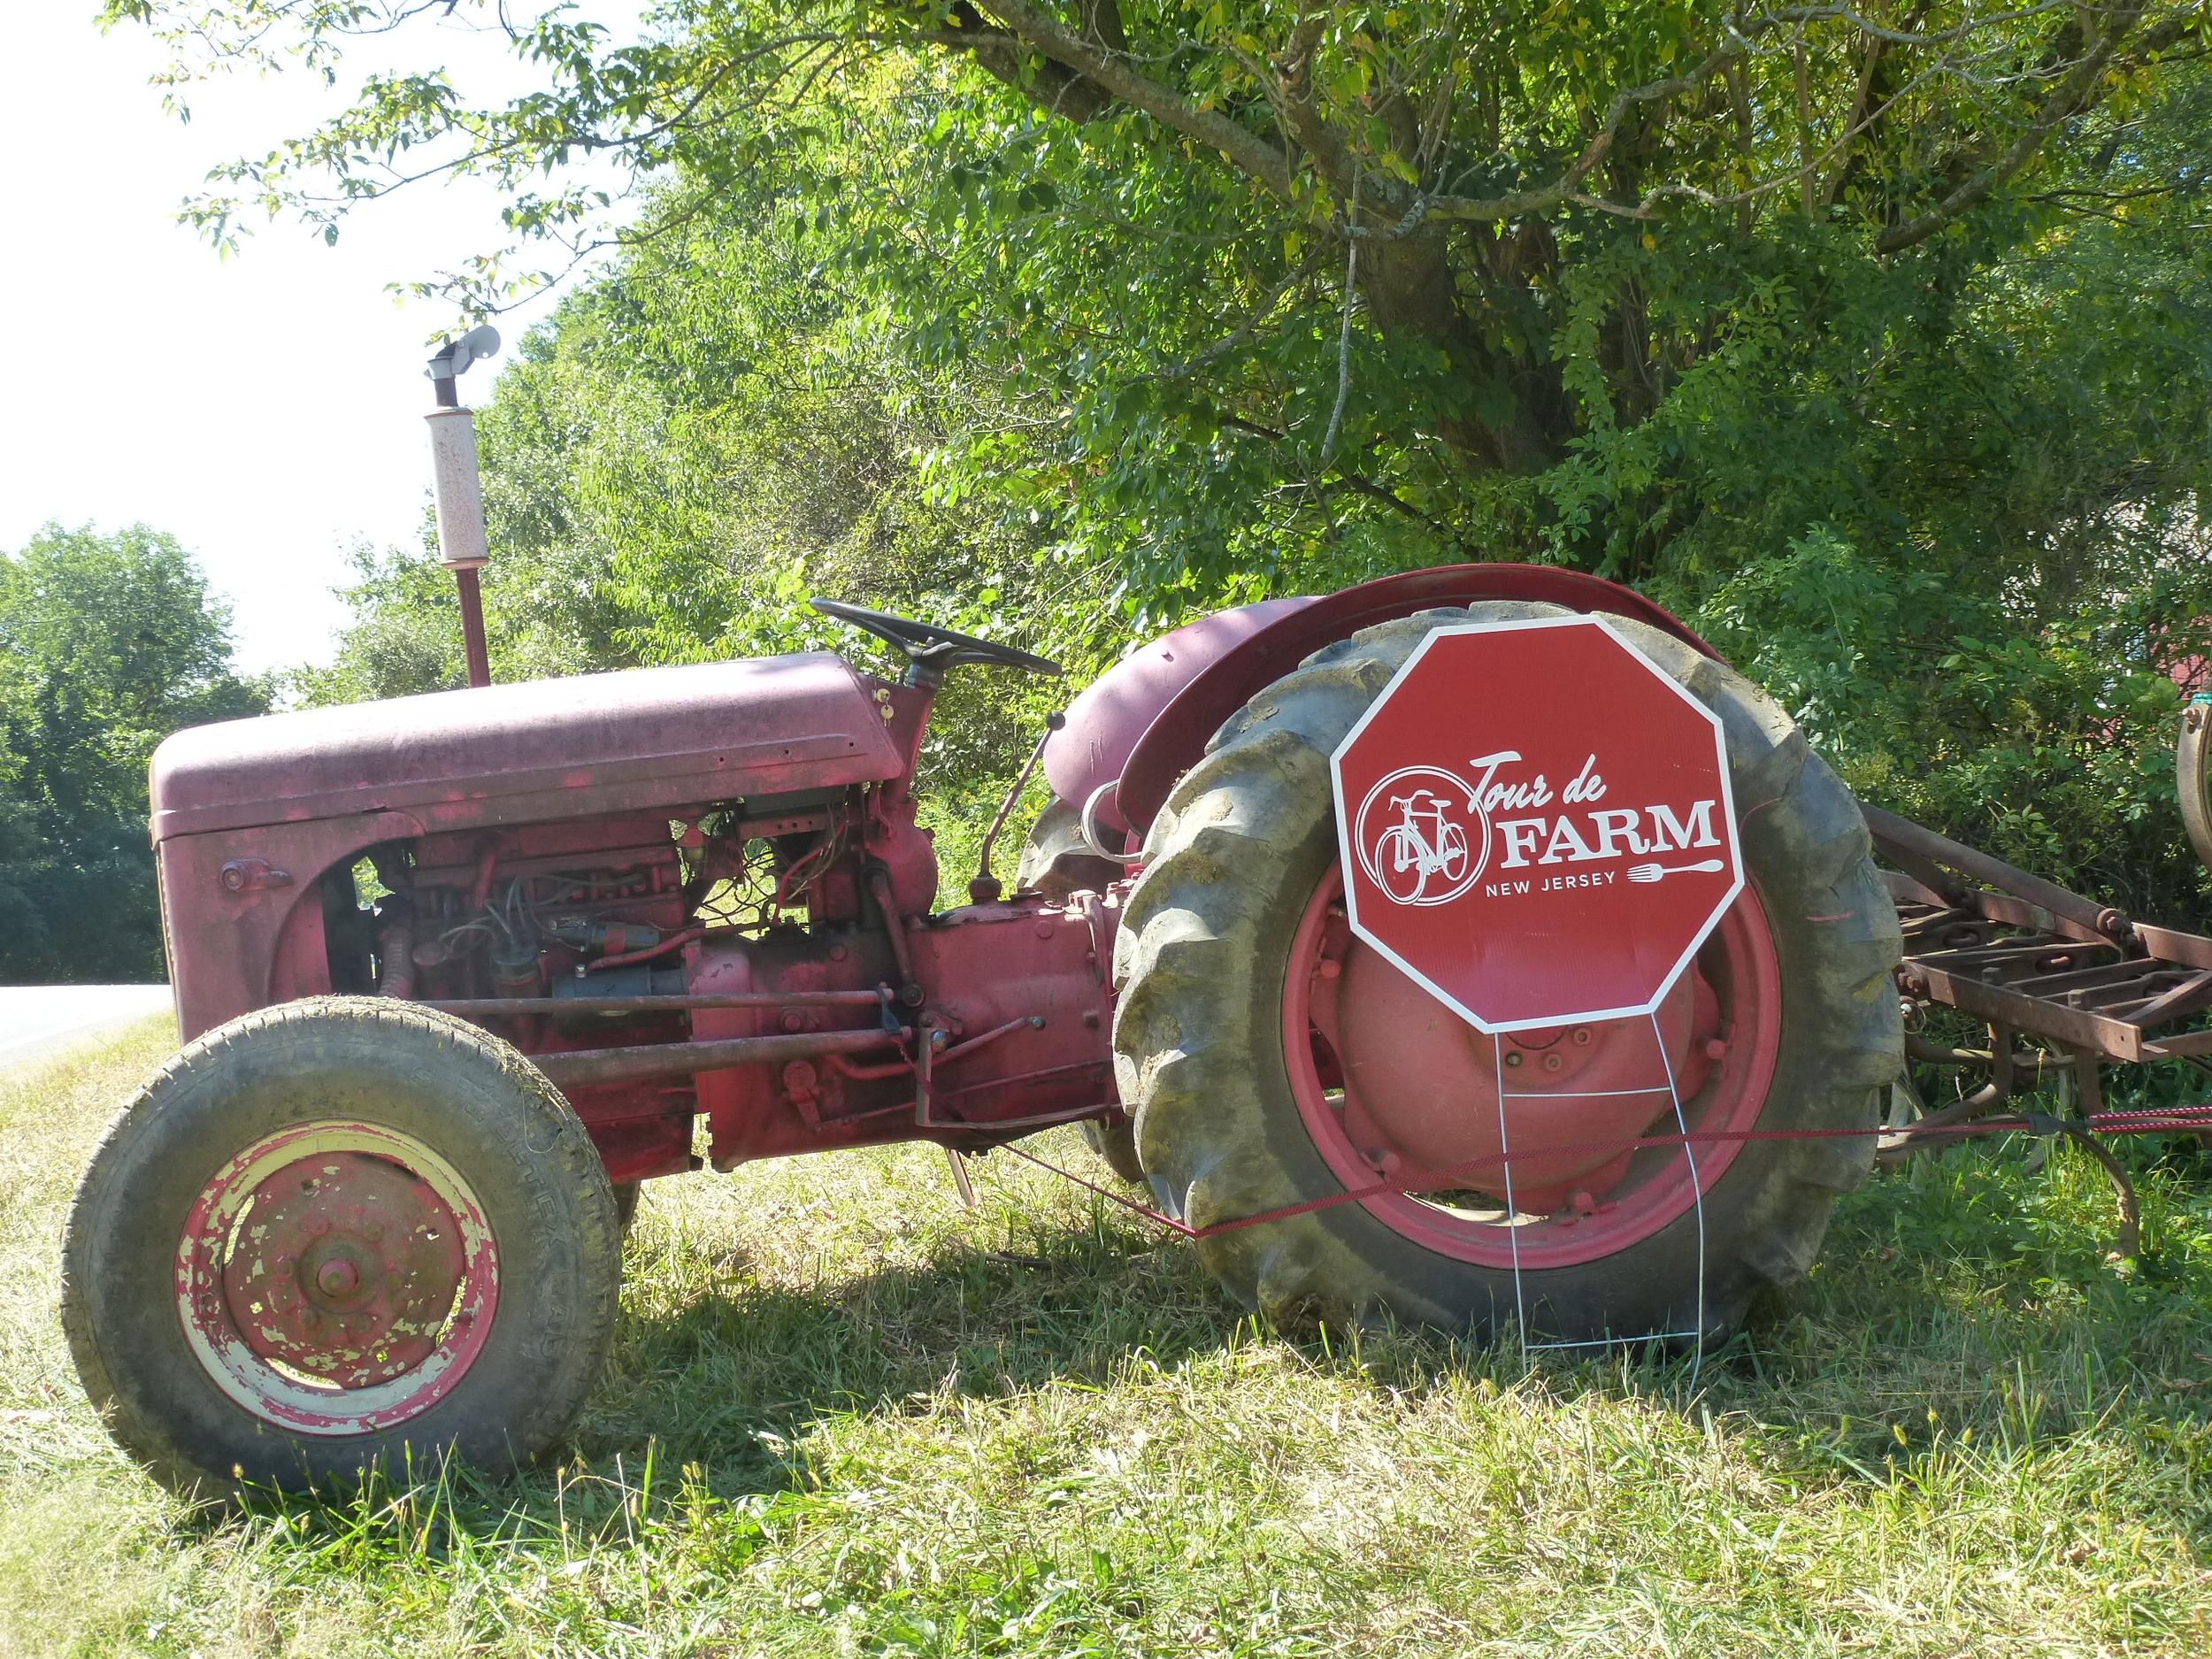 tourdefarmnj tractor